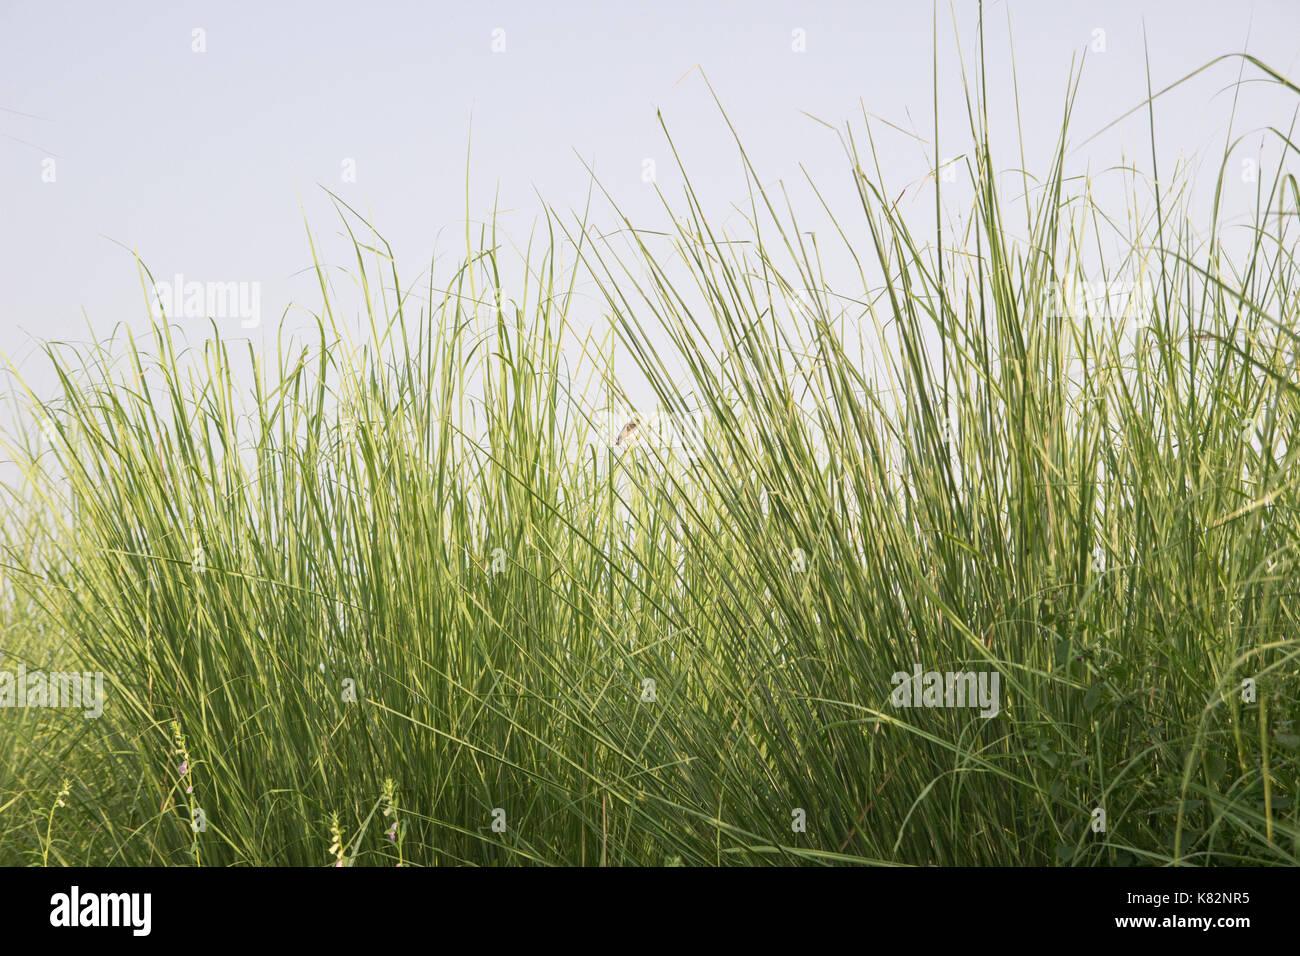 Fields of Bajra - Stock Image